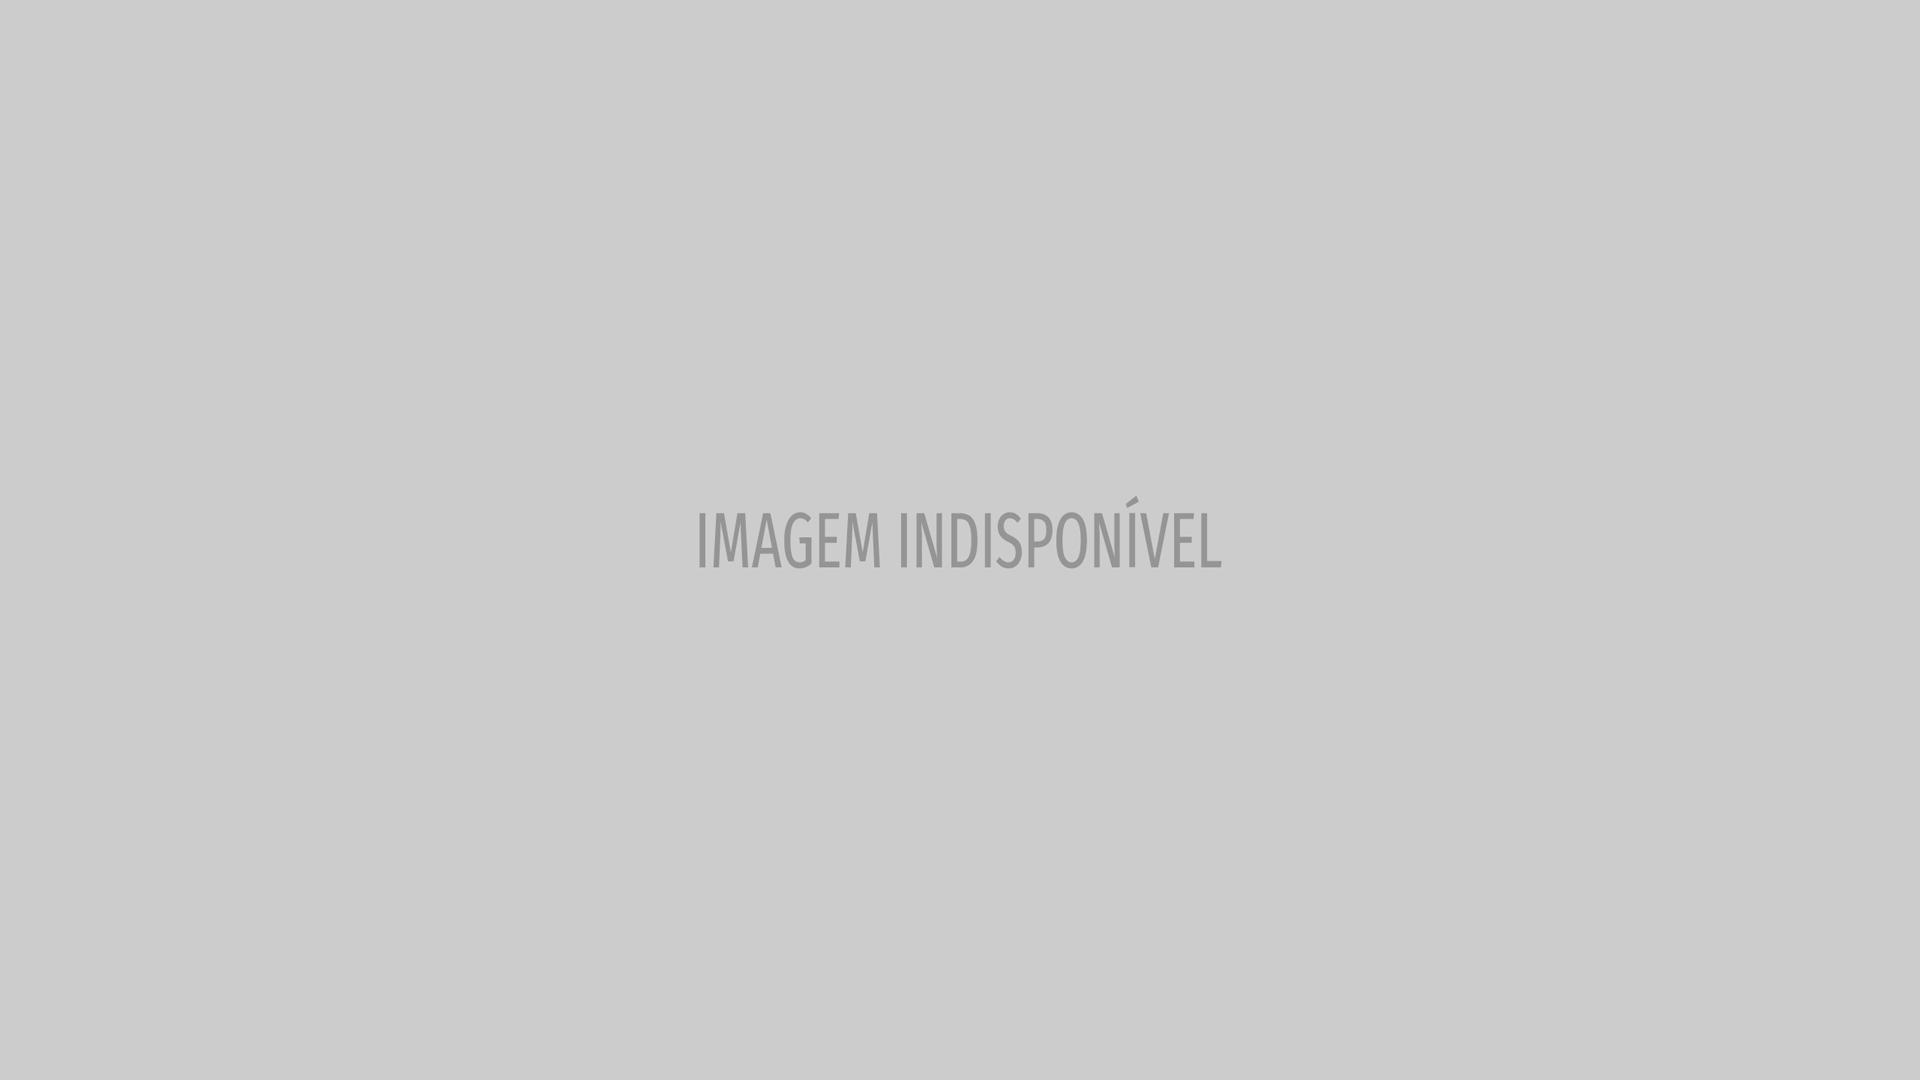 Ingrid Guimarães e Heloisa Périssé voltam a atuar juntas na TV